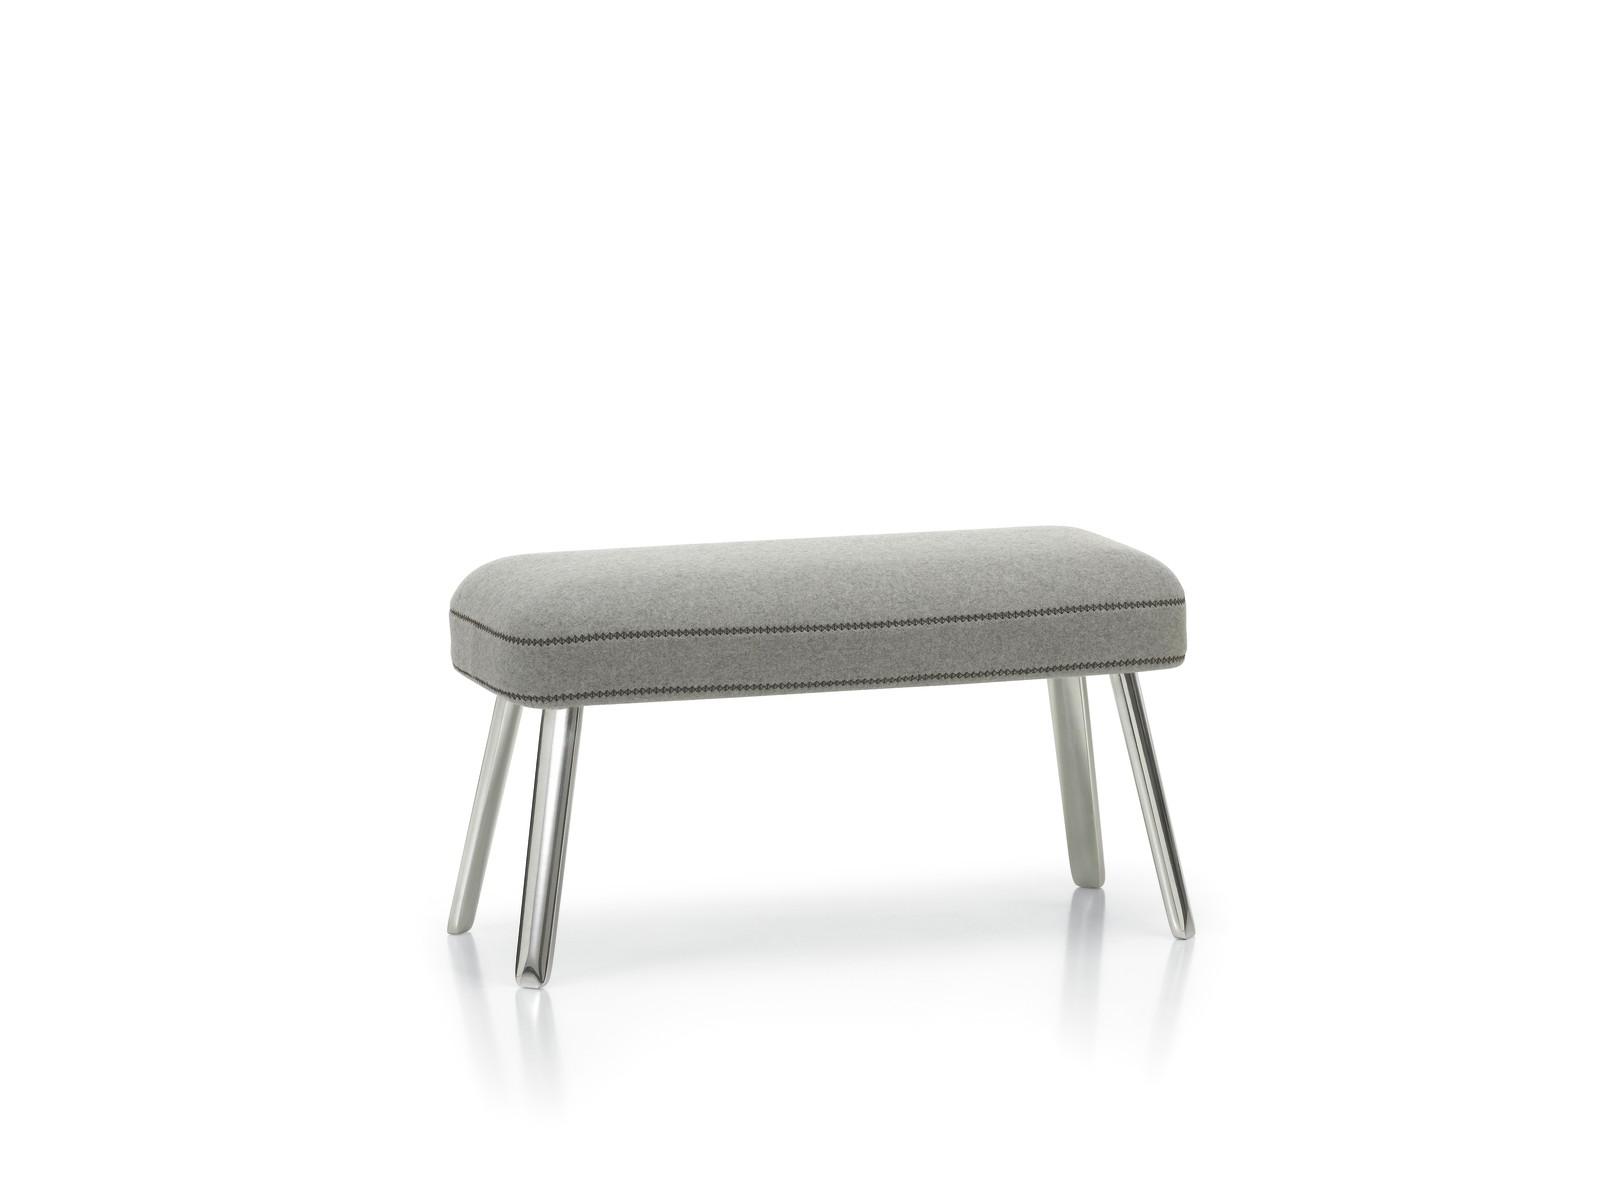 Repos Panchina 04 glides for carpet, Dumet 06 pebble melange, 02 aluminium polished, 75cm